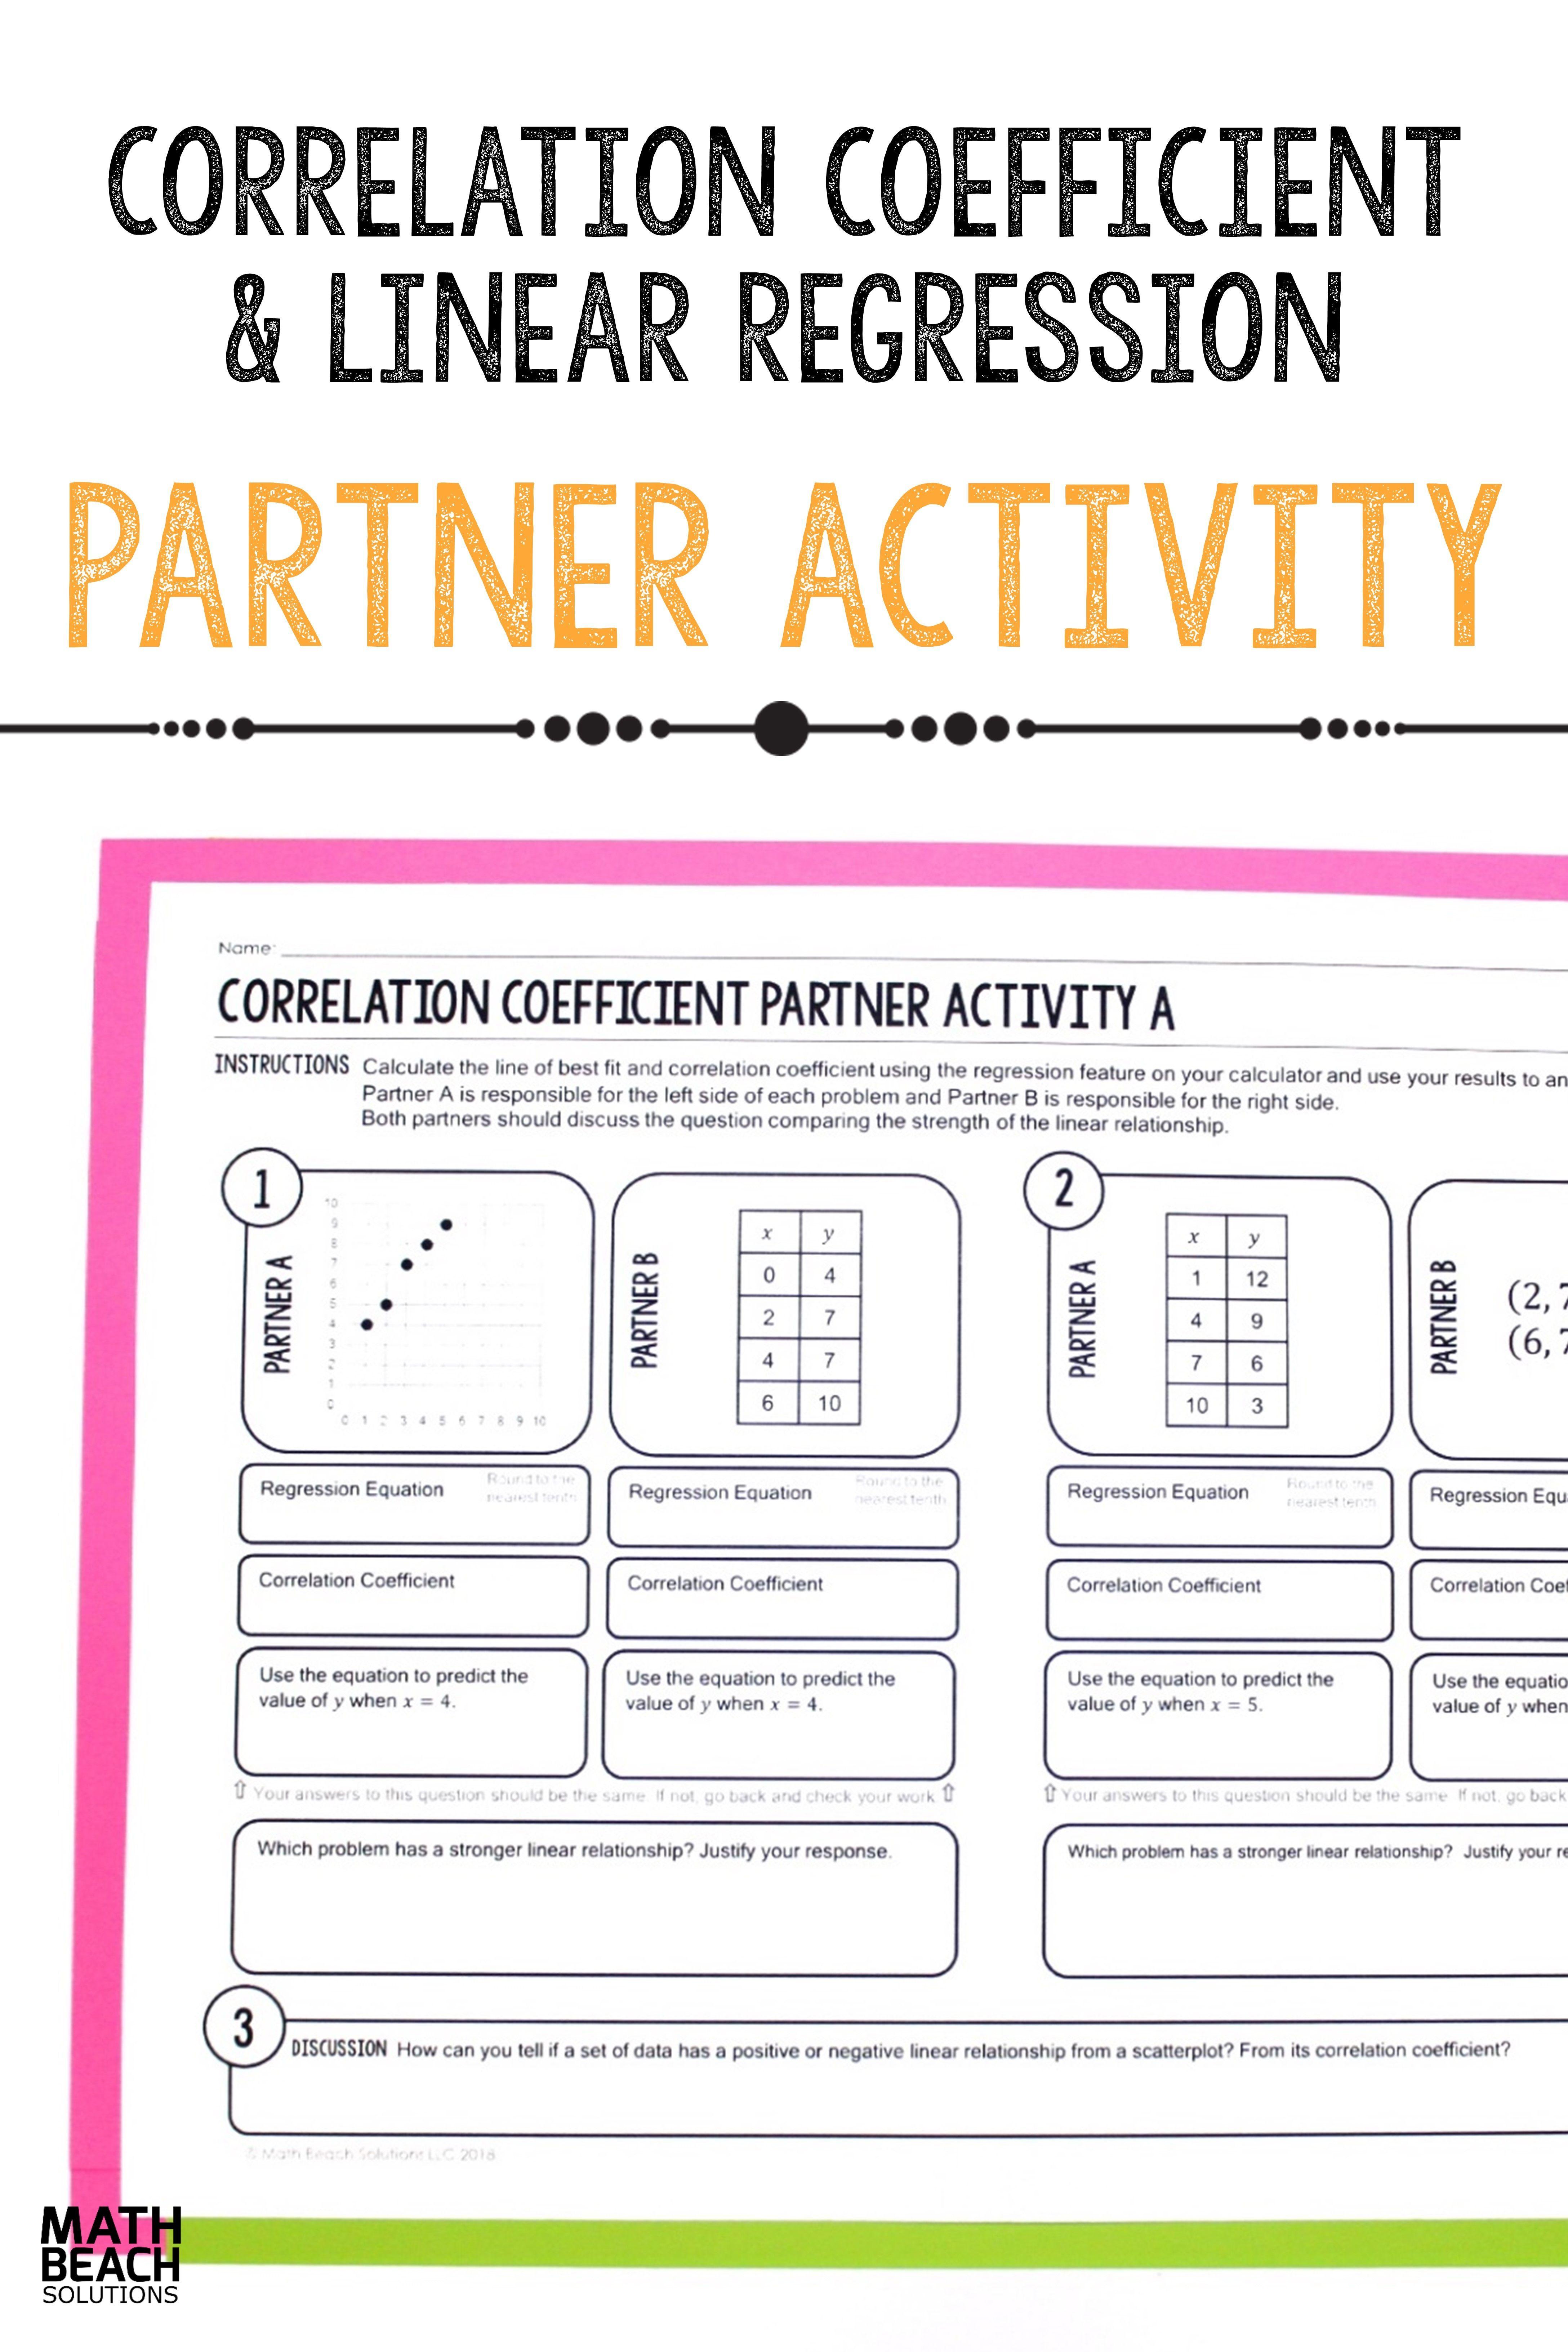 Correlation Coefficient Partner Activity Linear